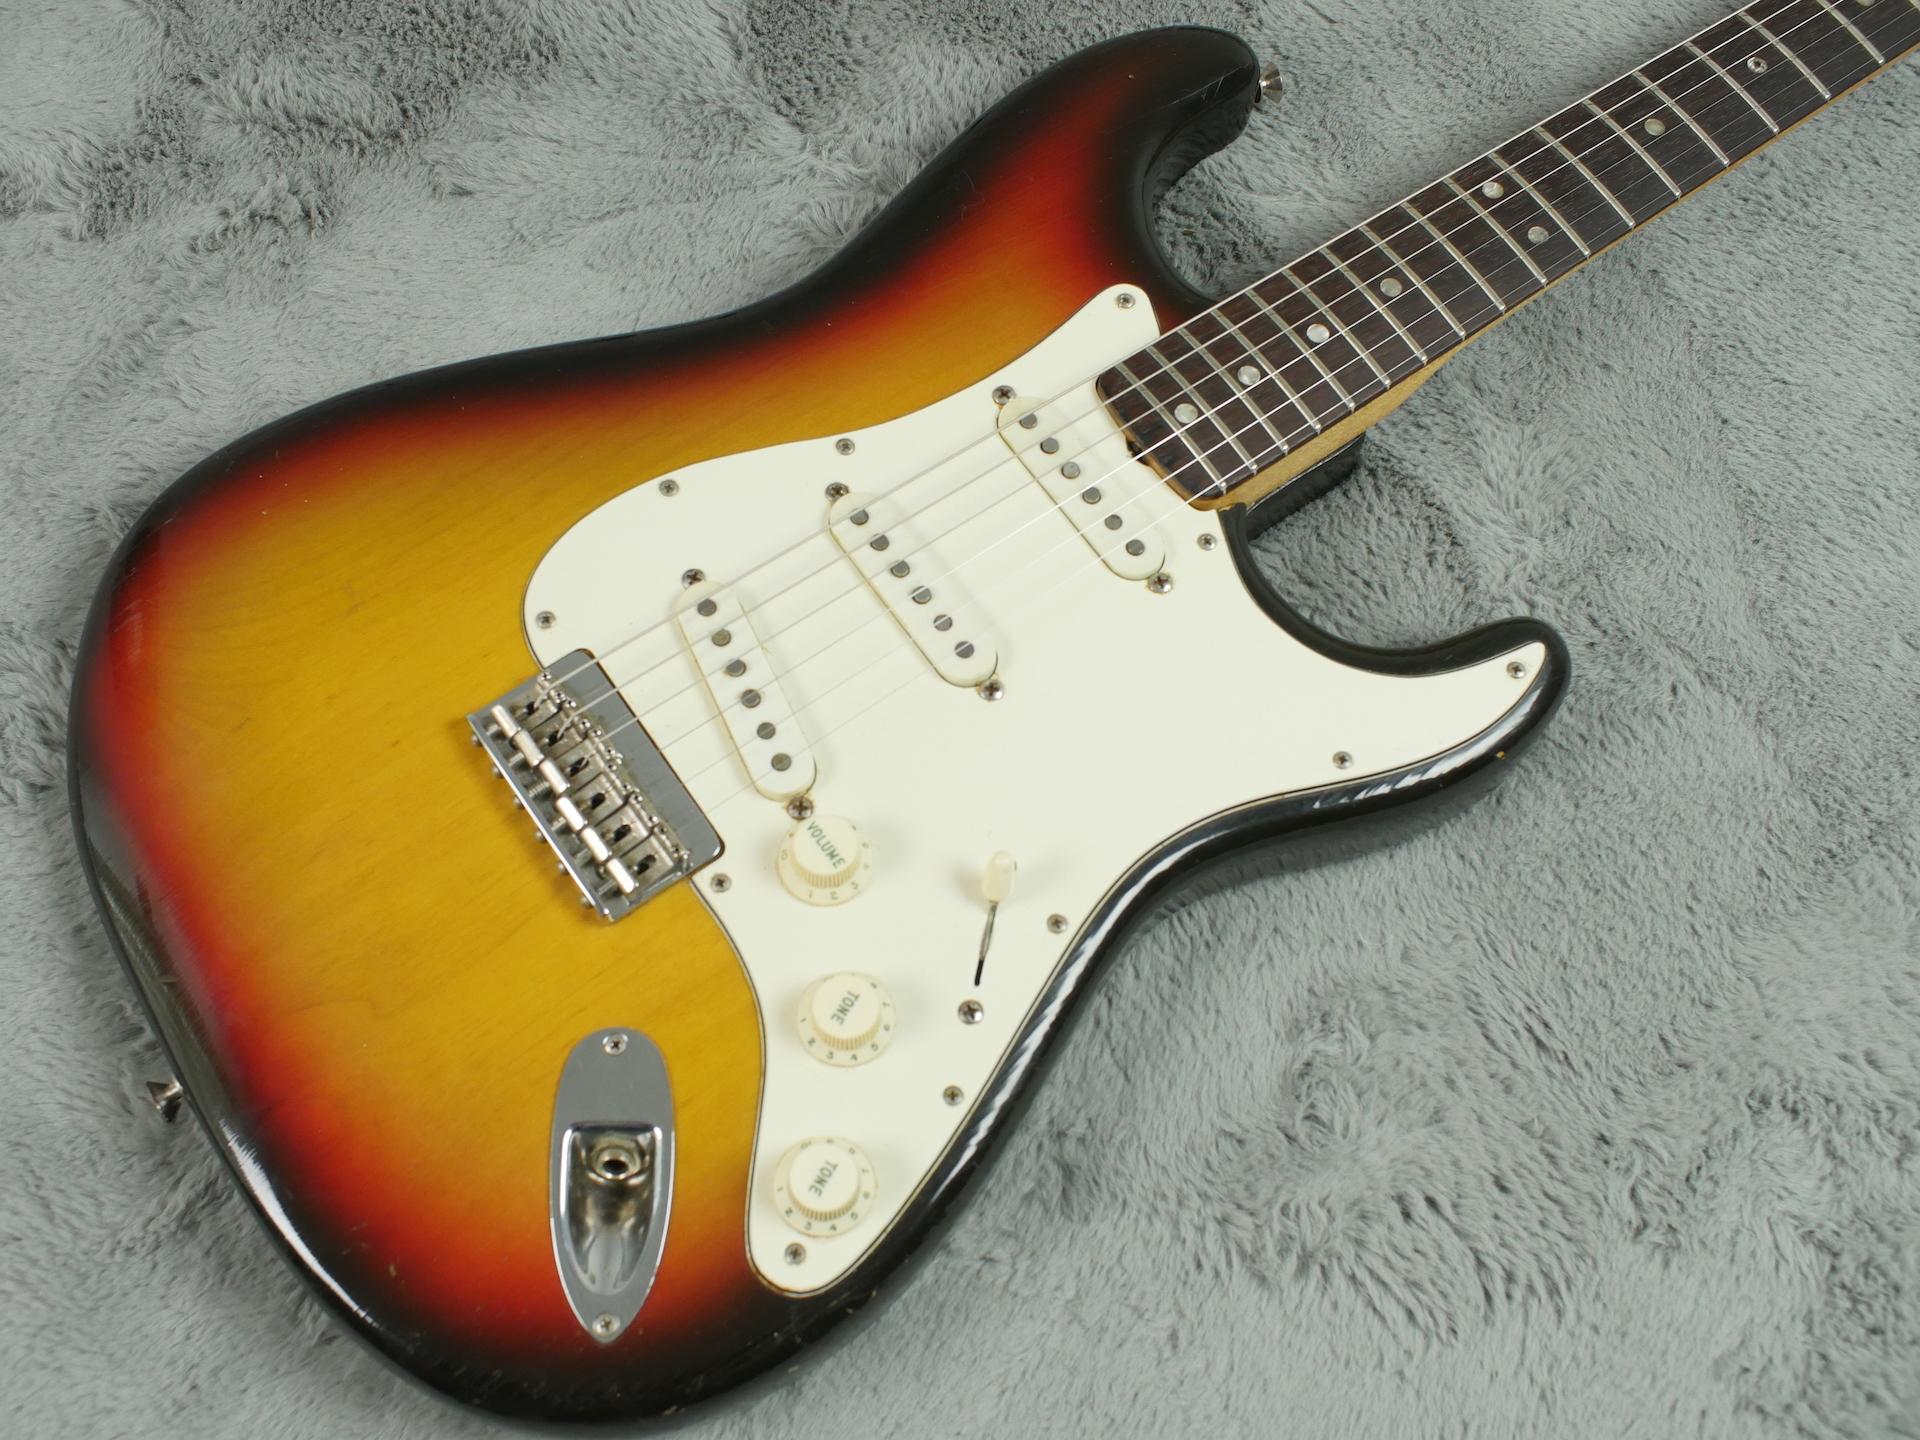 1971 Fender Stratocaster 4 bolt Hardtail + HSC